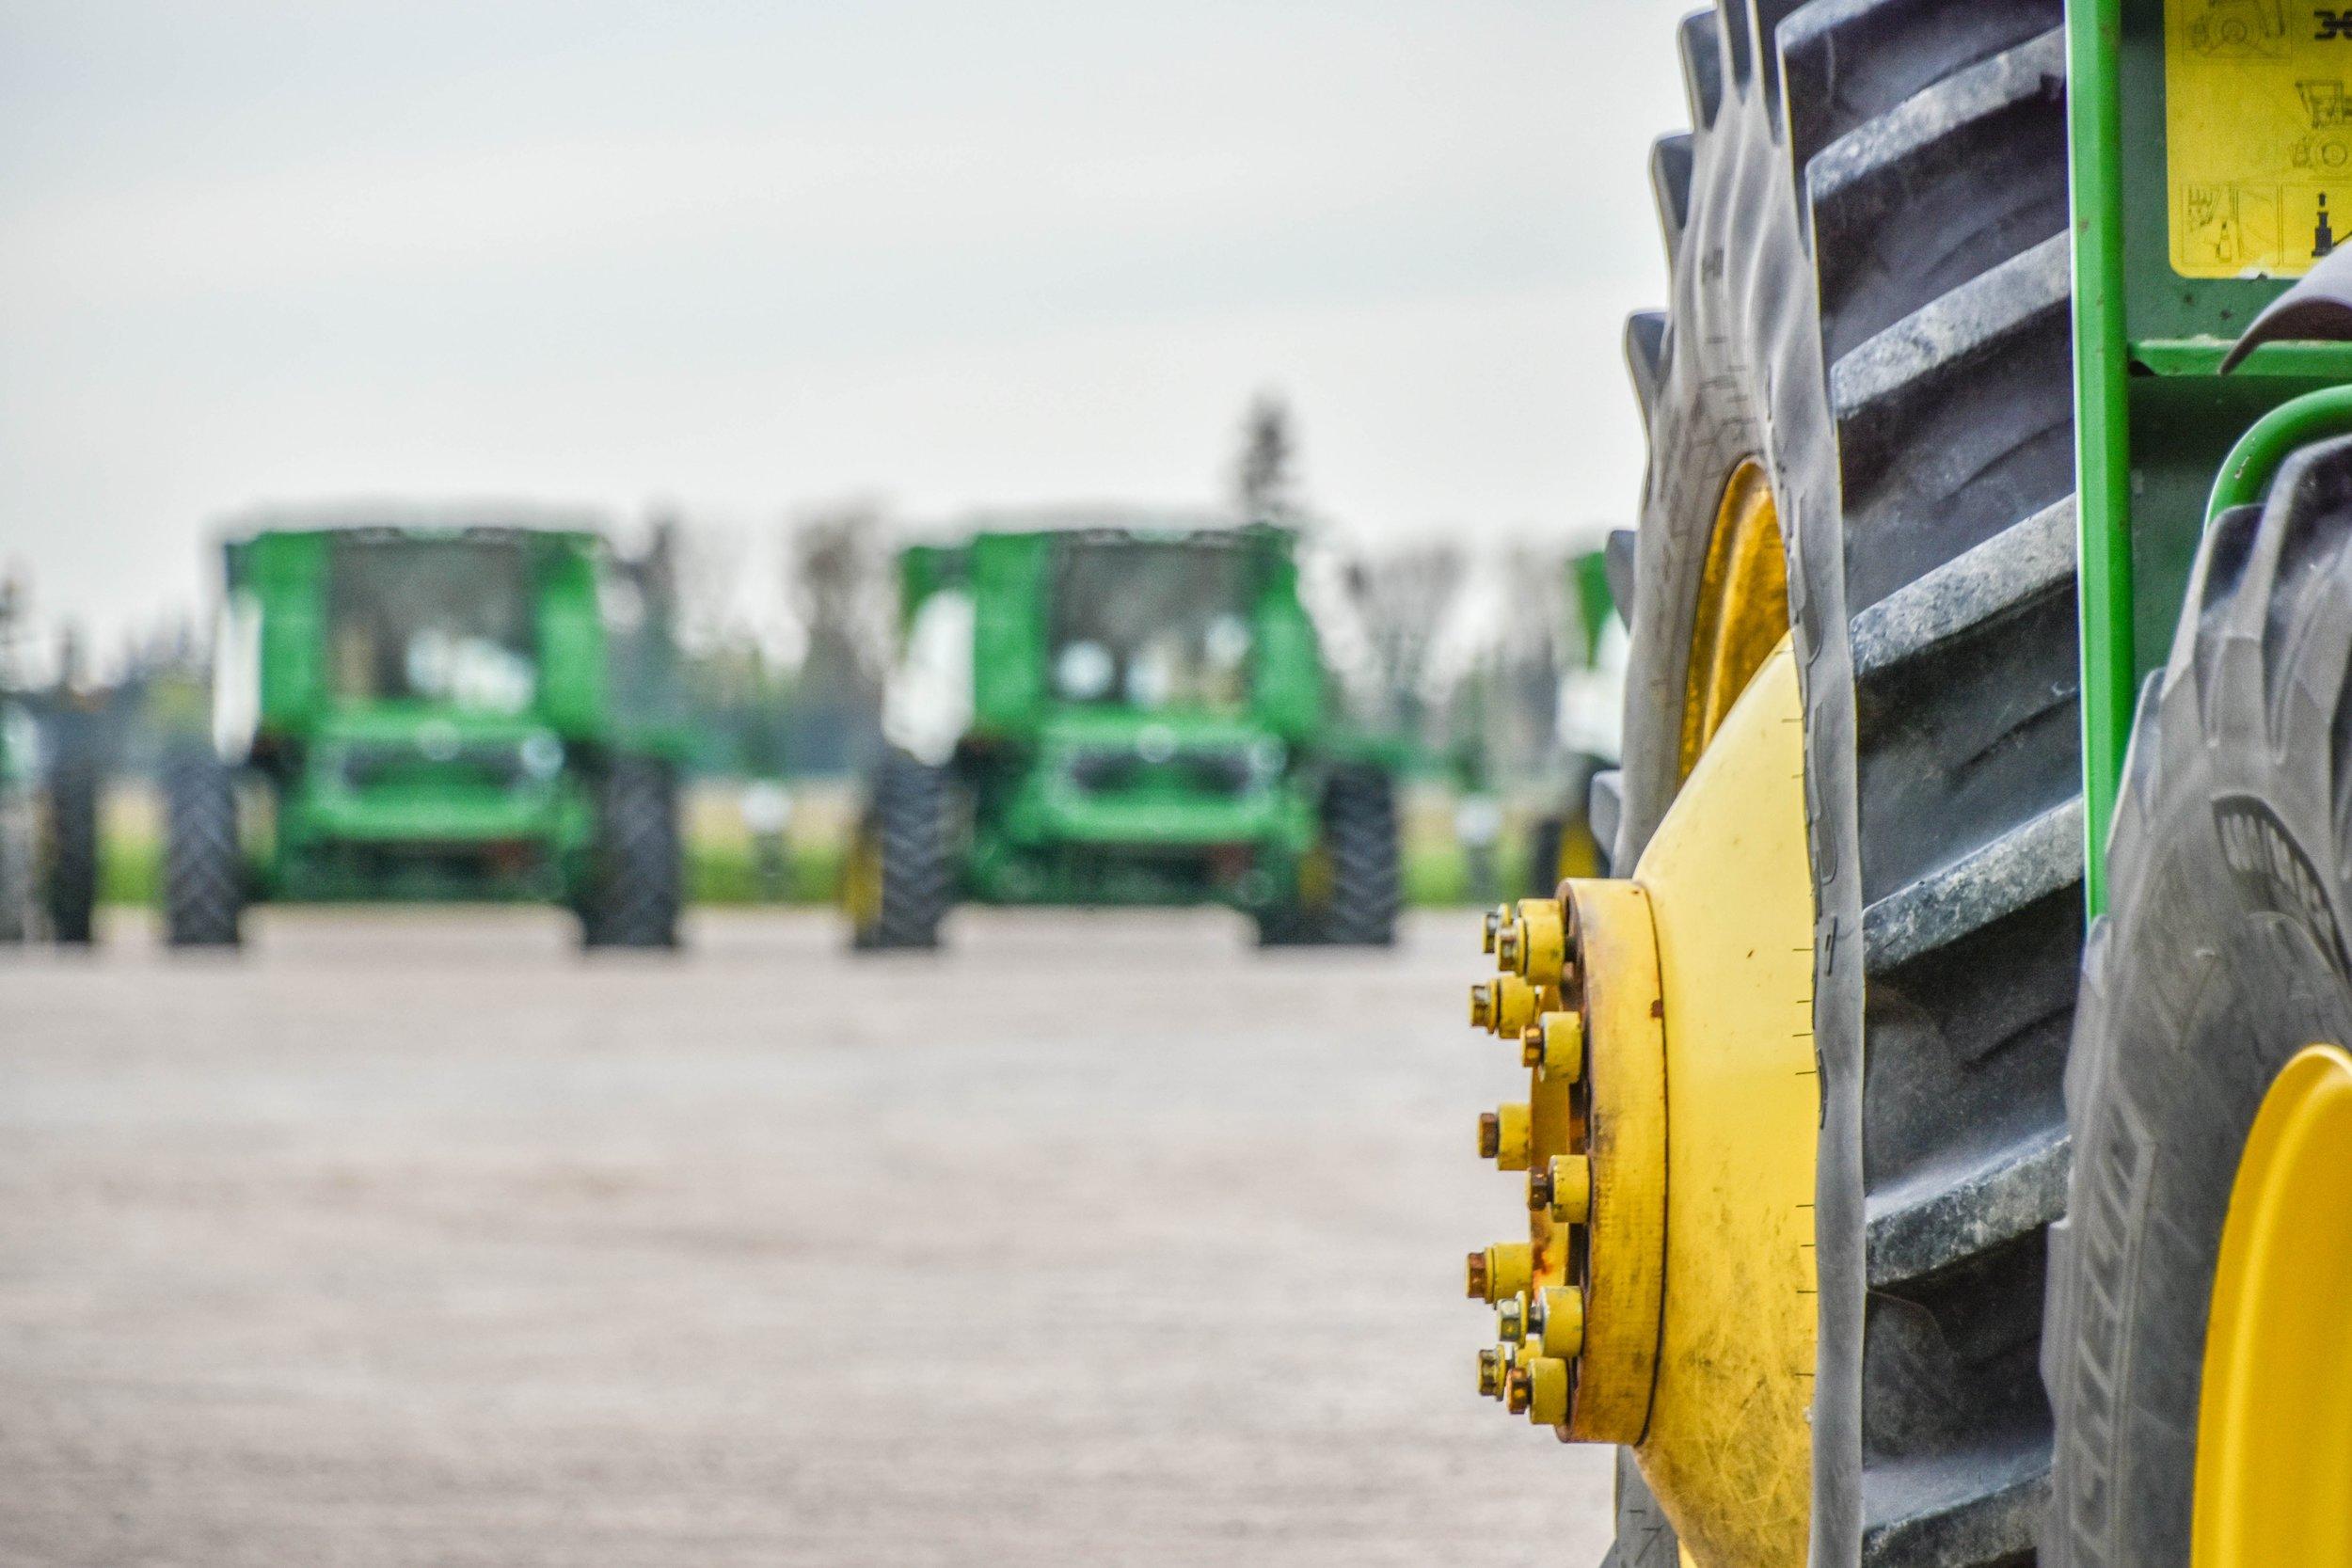 High Precision Navigational Technology for Robotic Farming